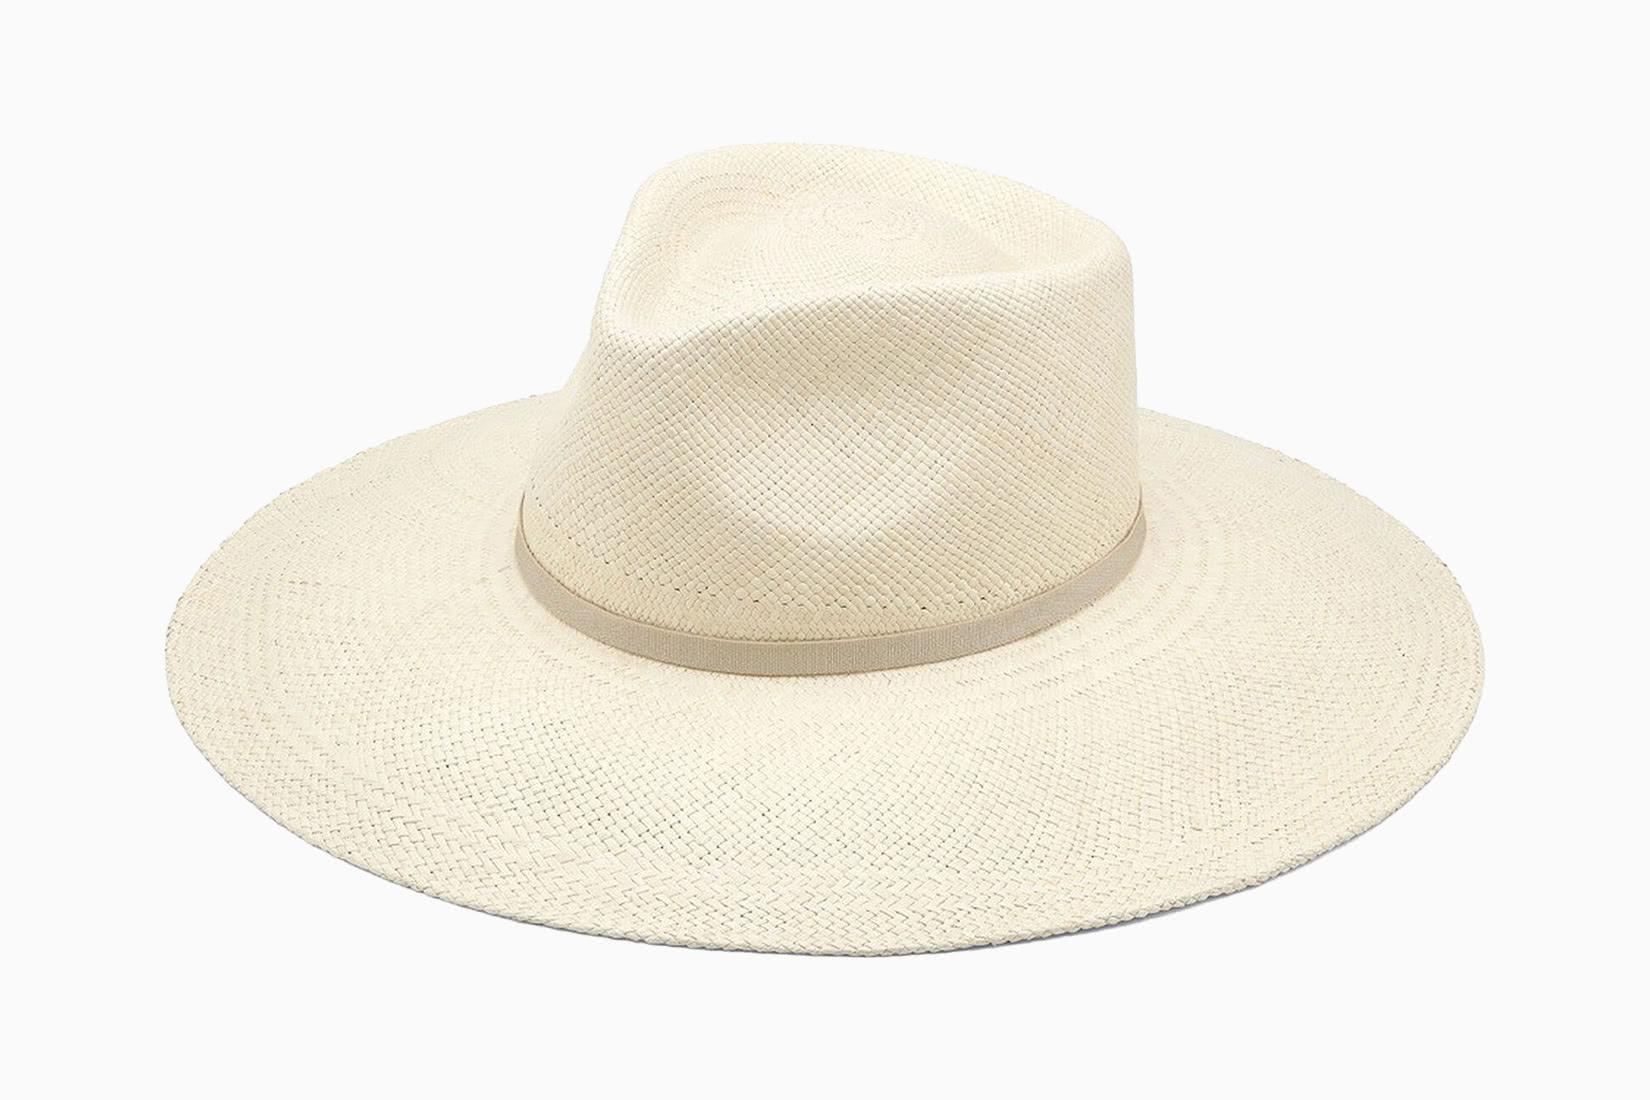 Cuyana wide brim summer hat review - Luxe Digital